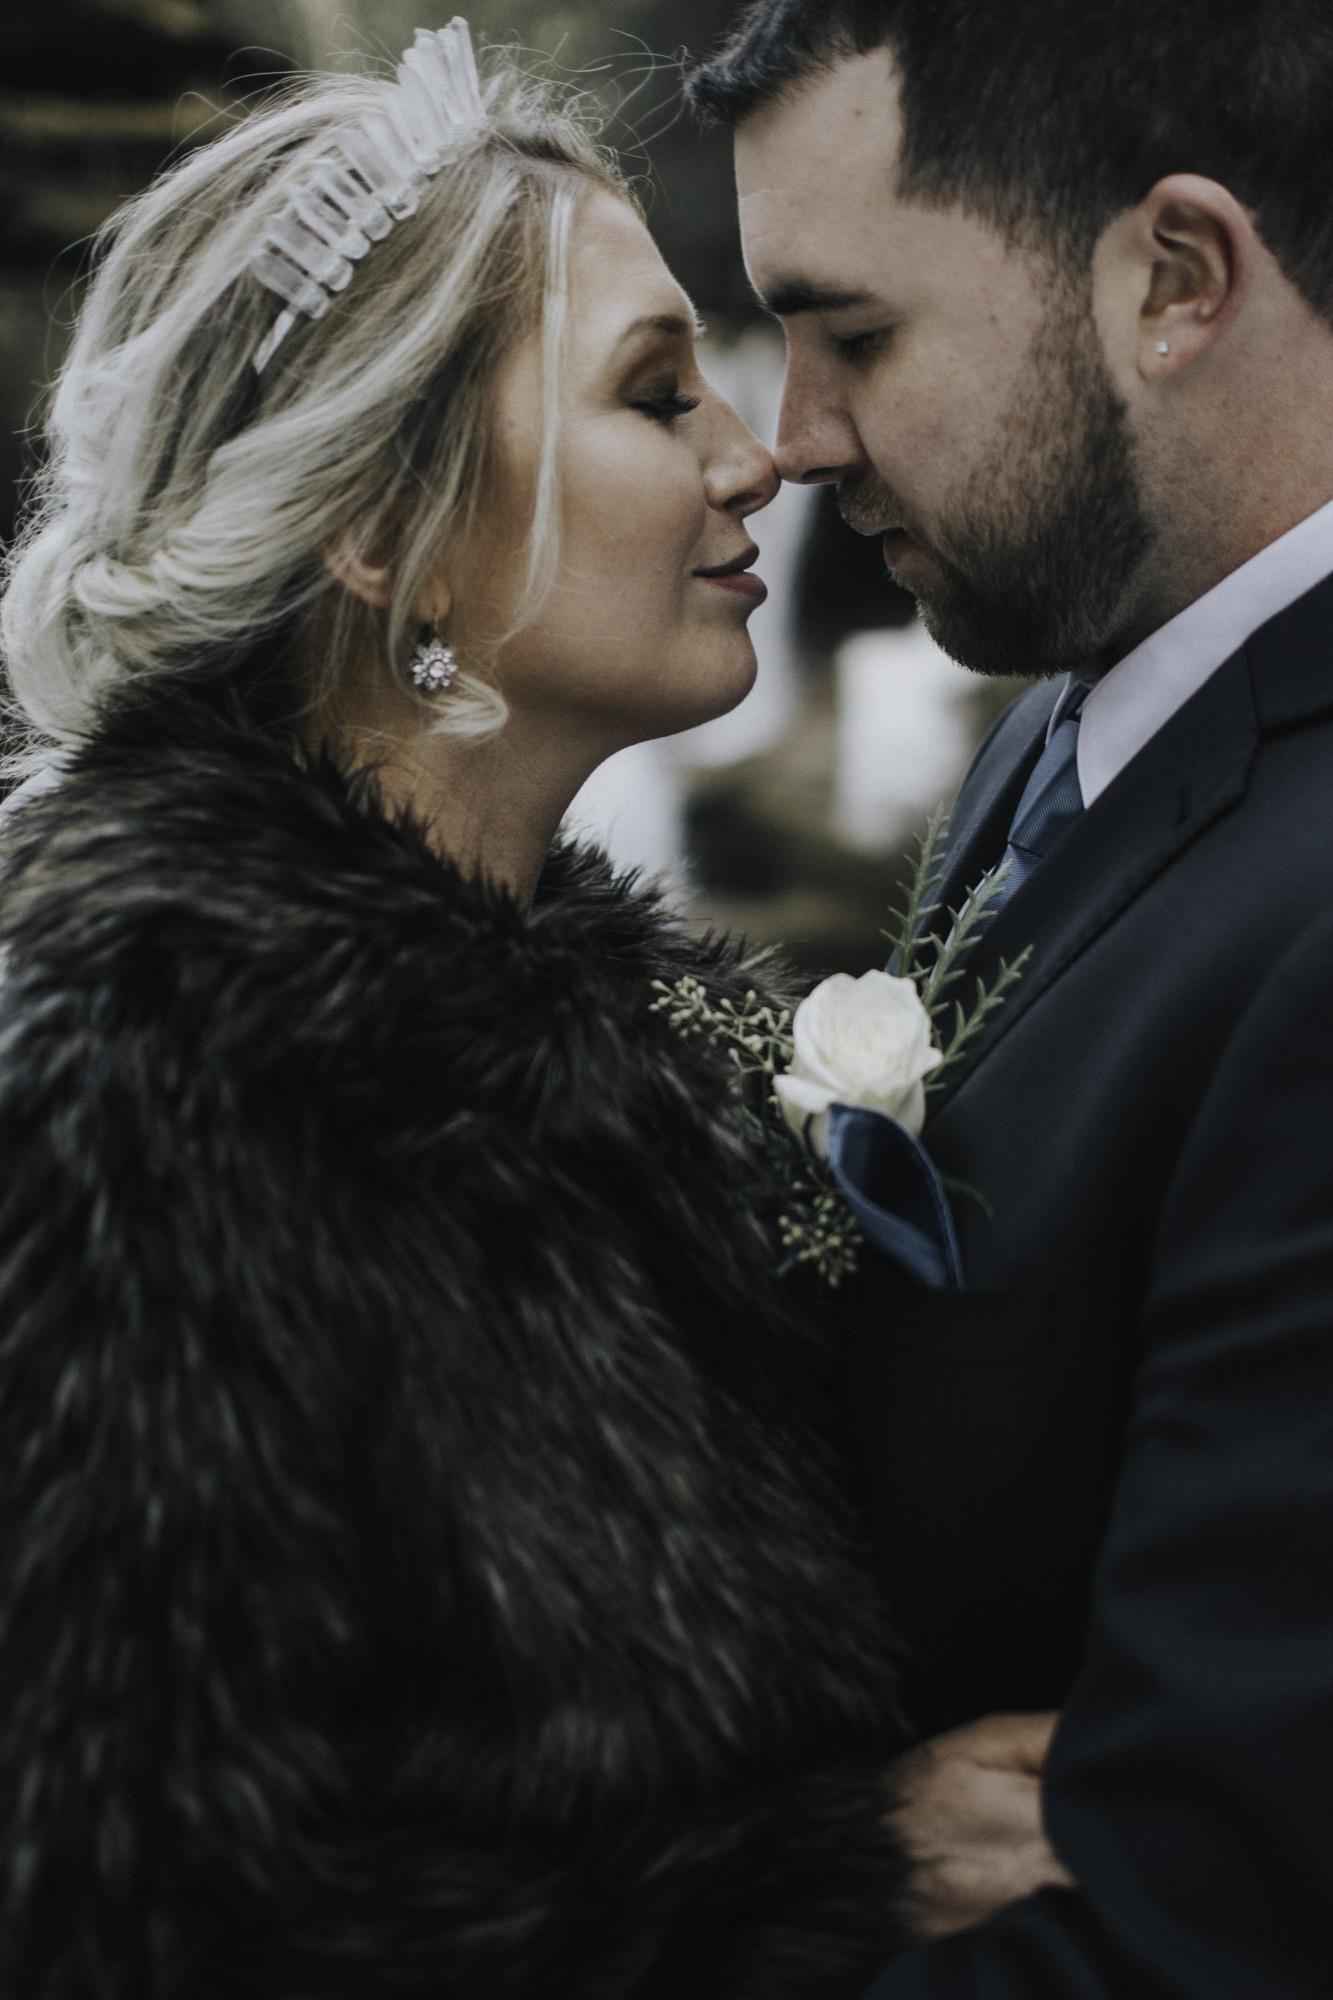 Cate_Ann_Photography_Dayton_Ohio_Wedding_Elopement_And_Engagement_PhotographerDSC_6144-3.jpg